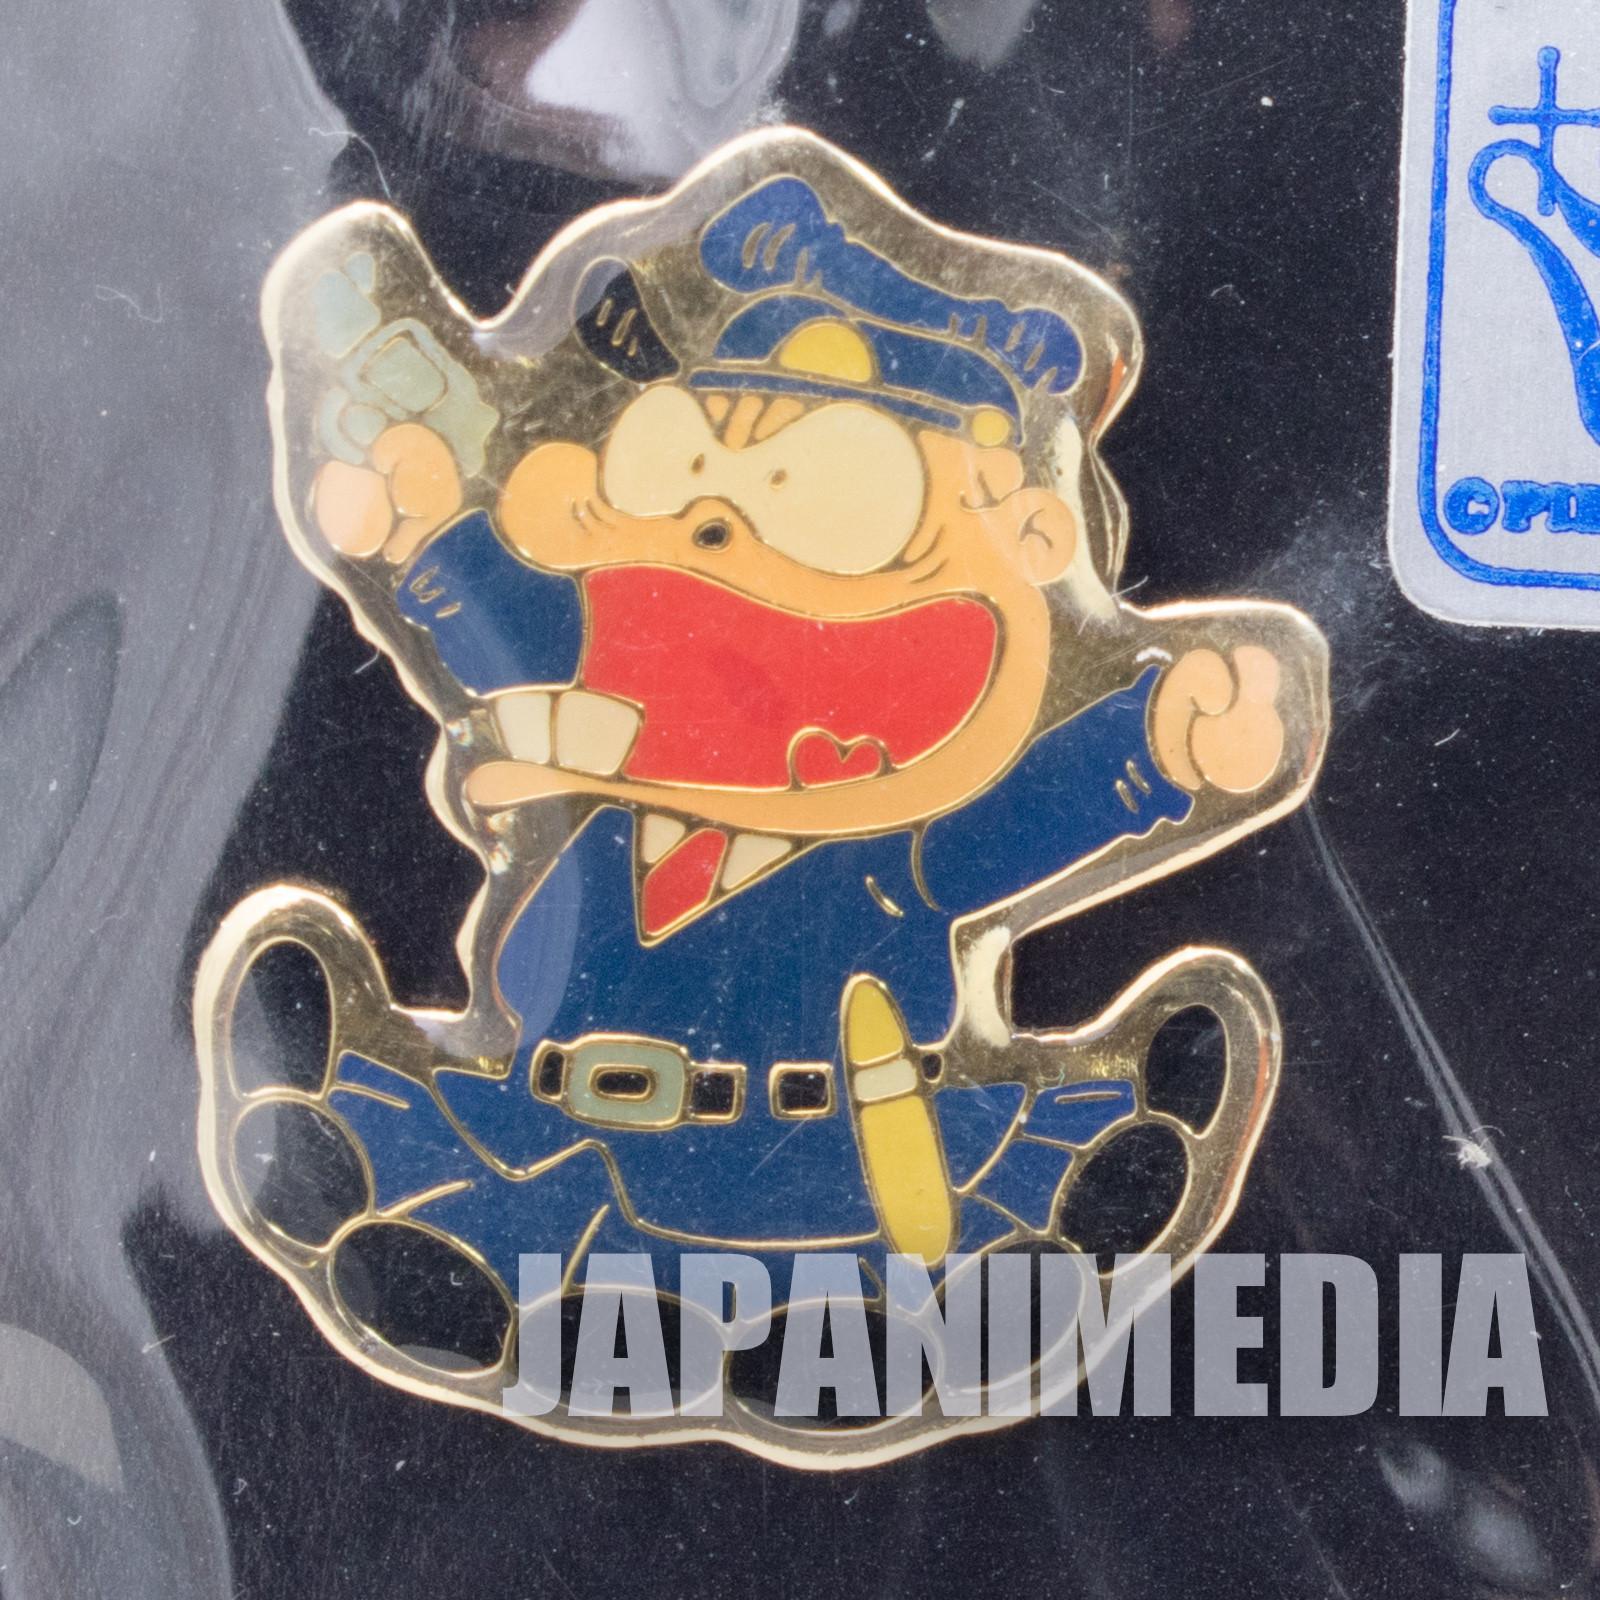 Genius Tensai Bakabon Police Officer Metal Pins Fujio Akatsuka JAPAN ANIME